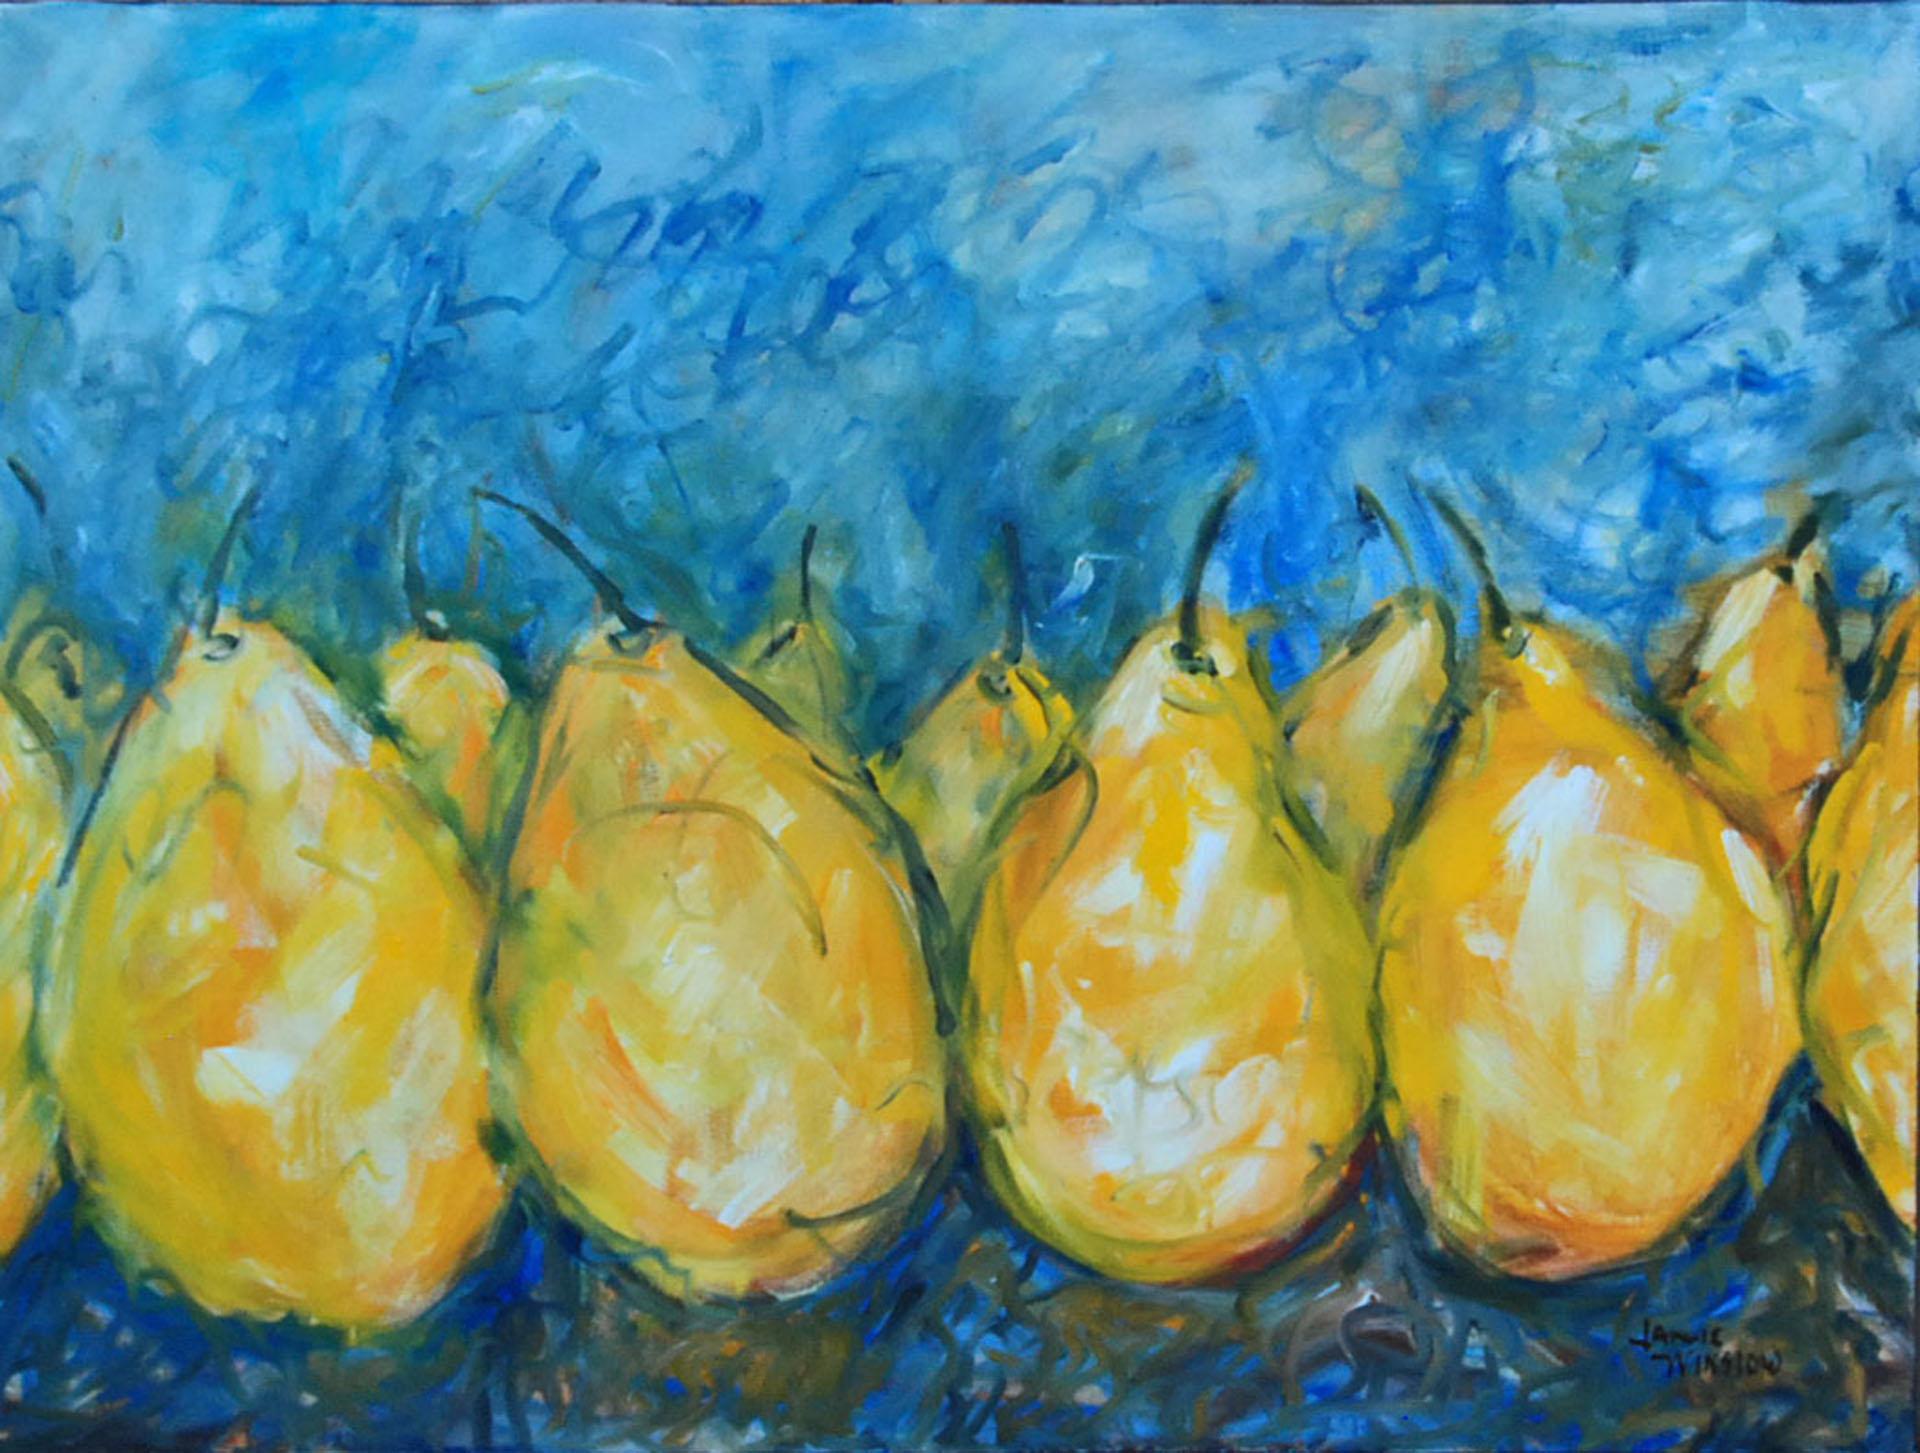 Jamie Winslow: Nodding Pears